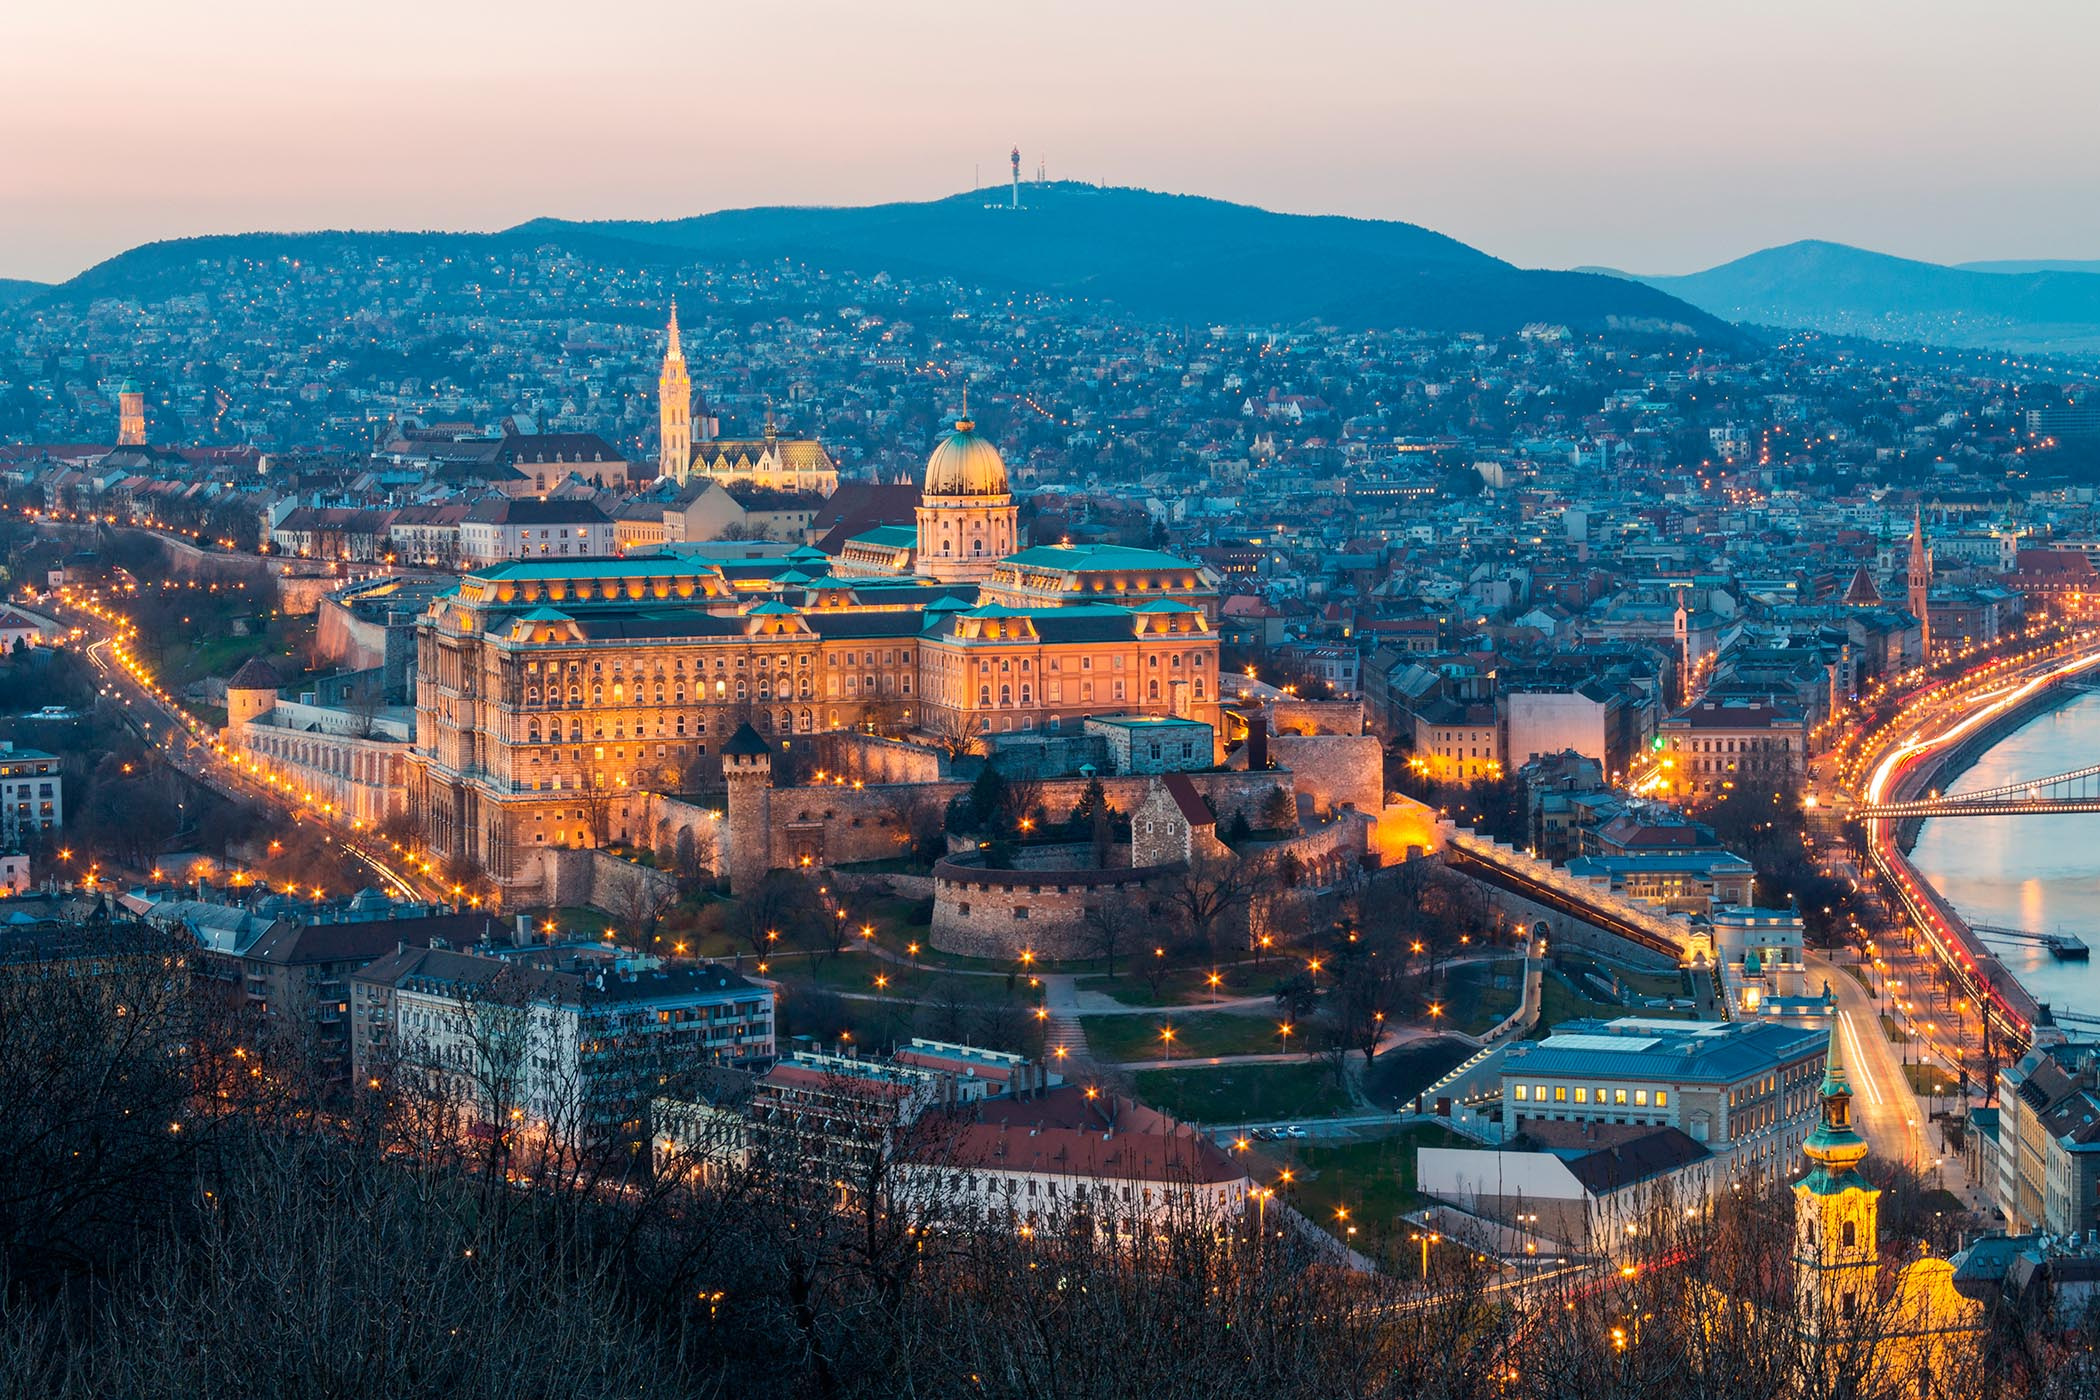 budapest-5-motivi-spettacolo-architettonico-.jpg